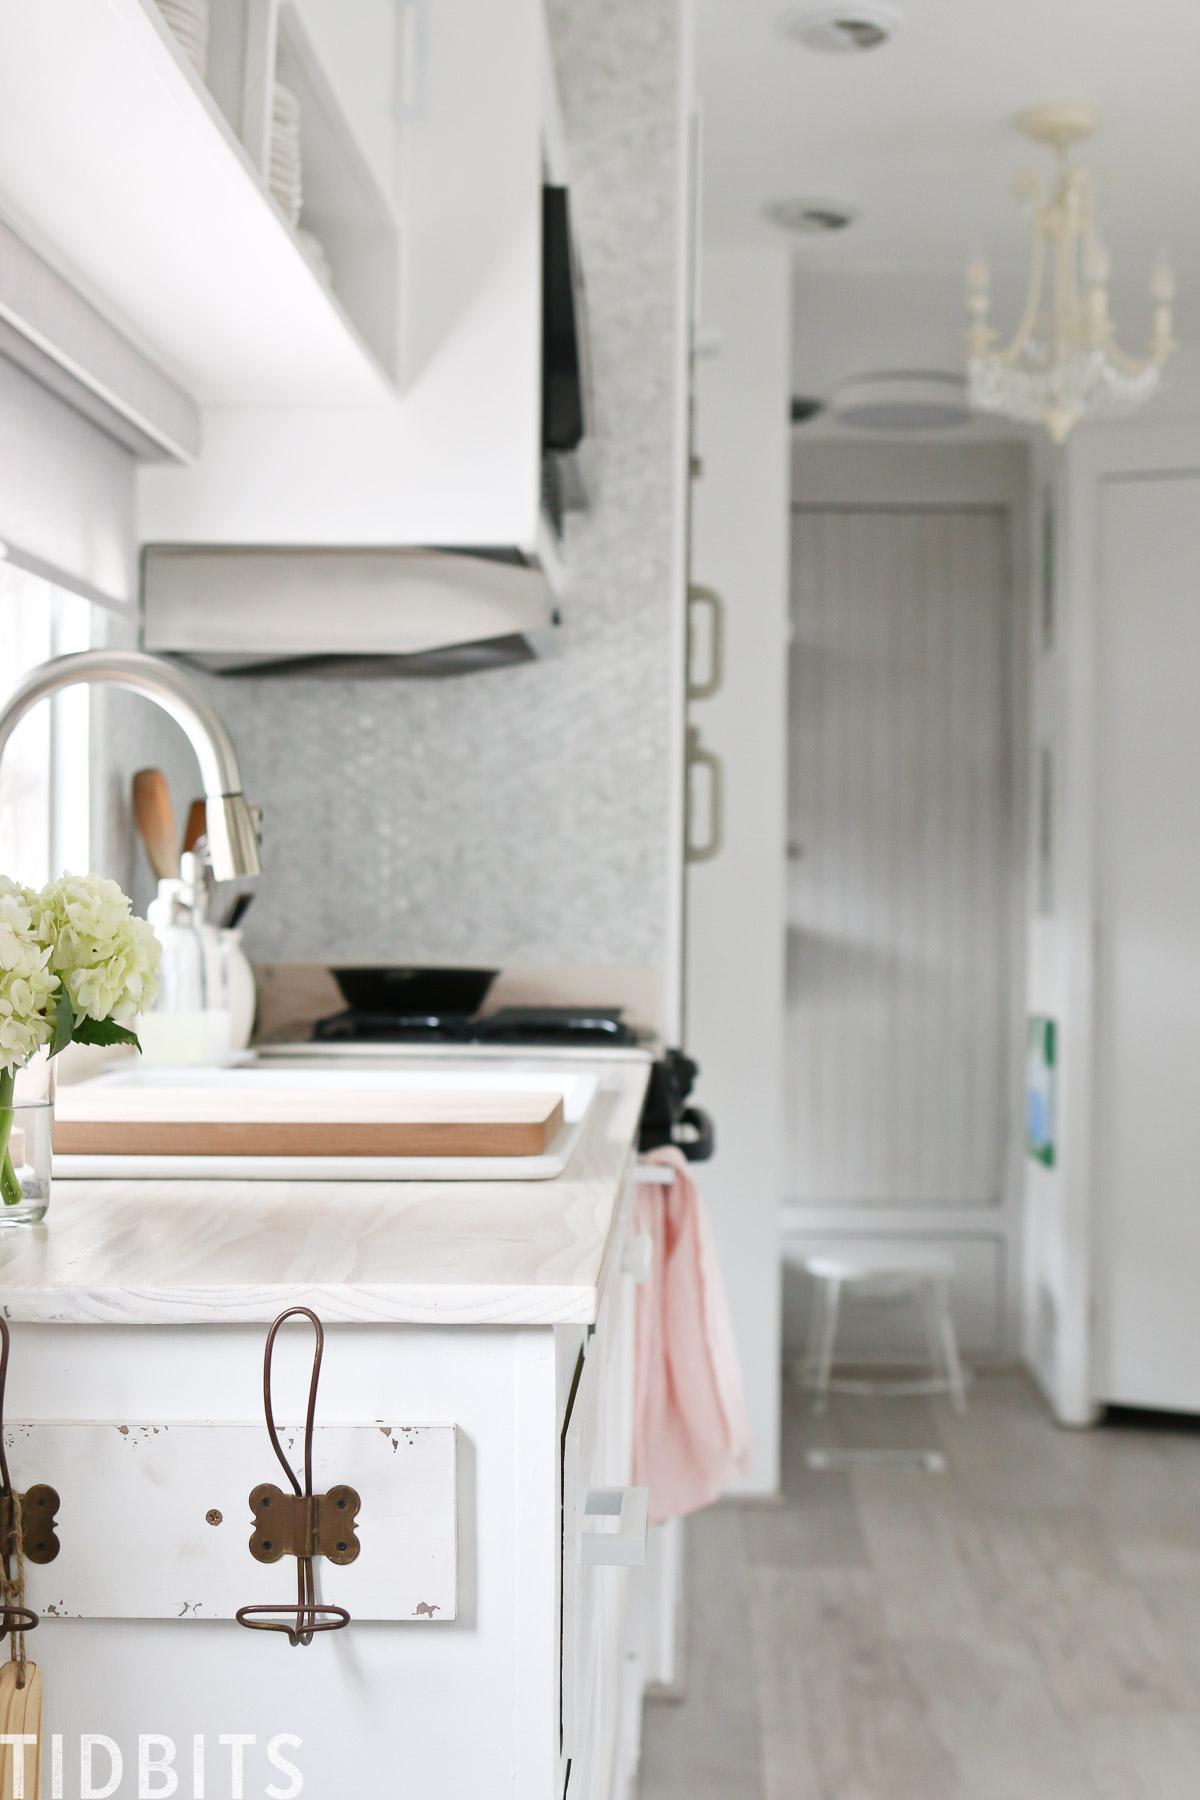 TIDBITS ON WHEELS RV renovation, Kitchen details.